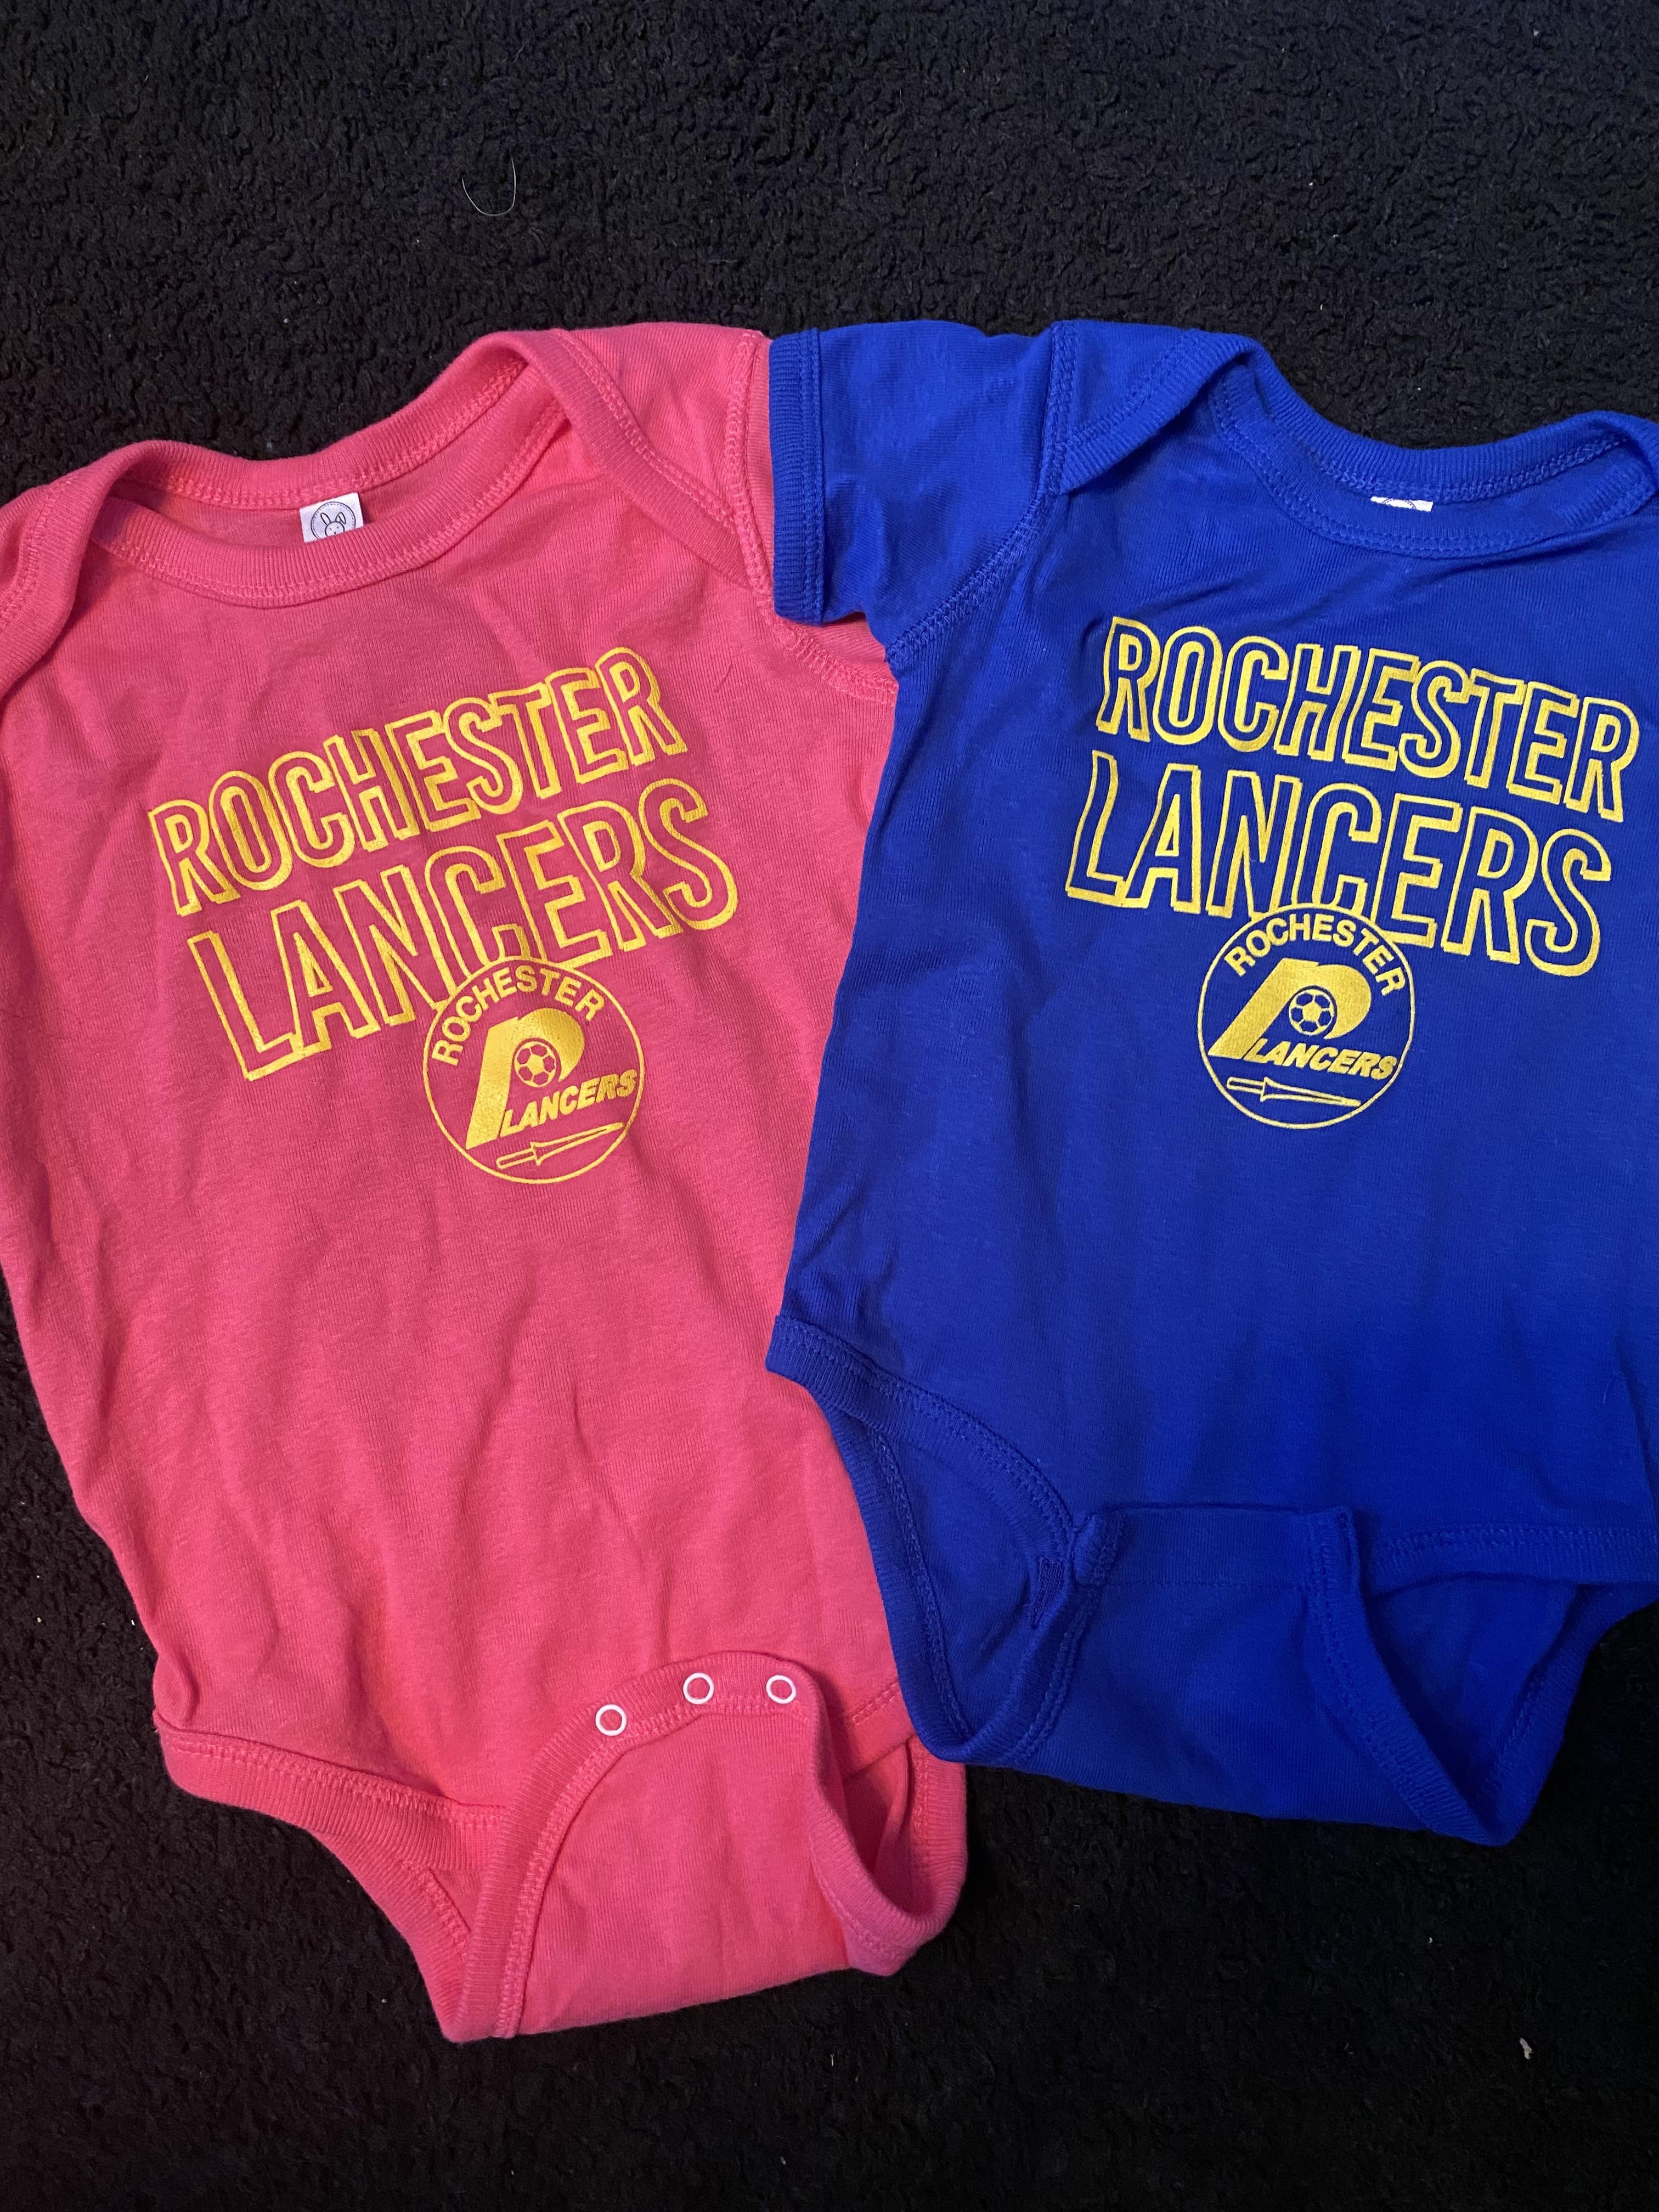 Lancer Baby Onesies